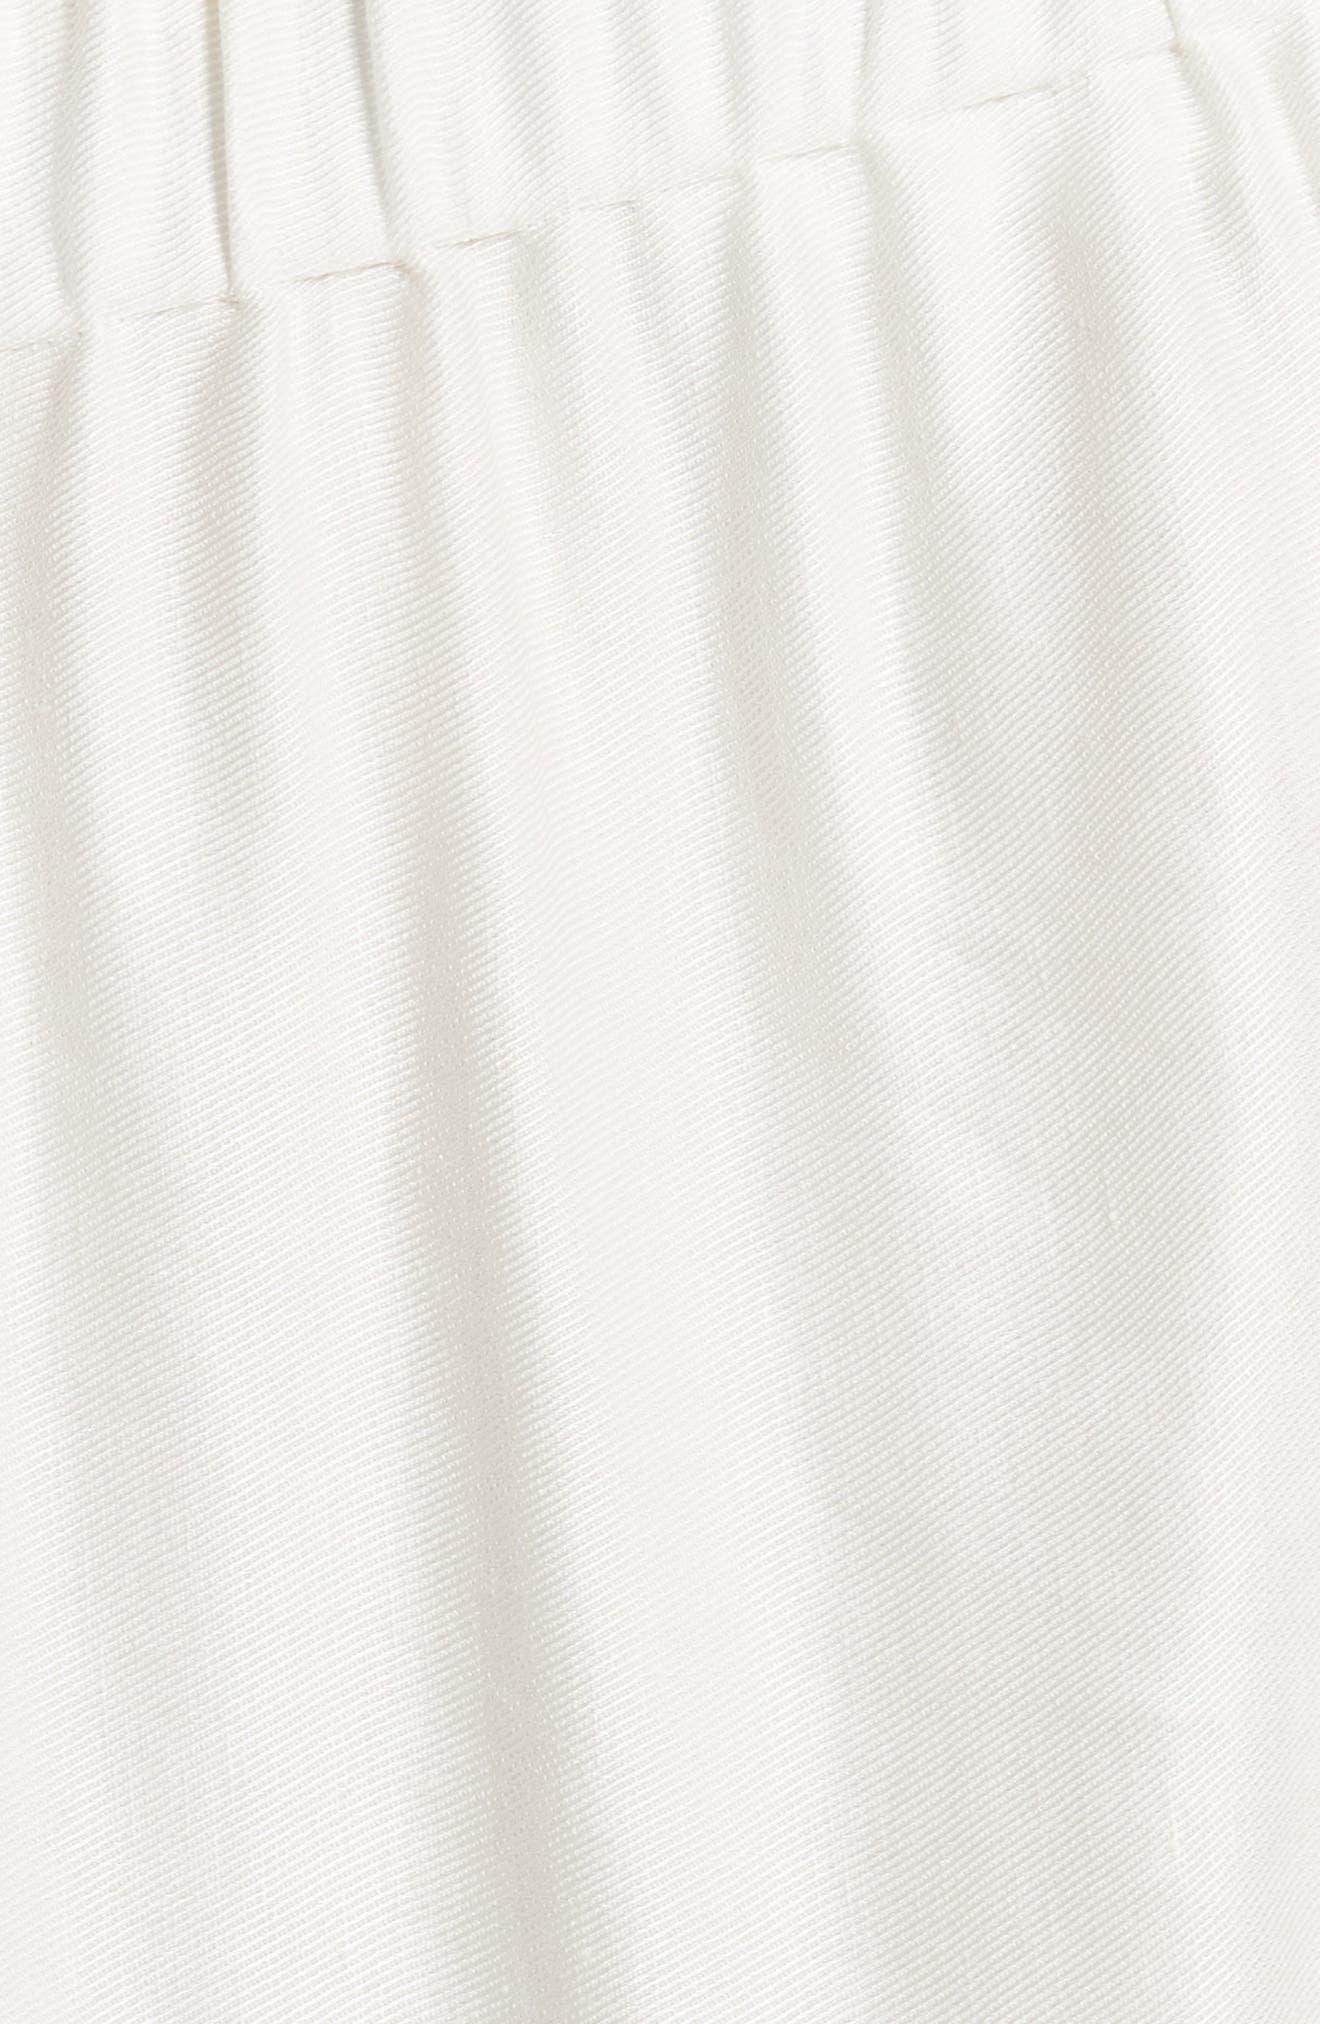 Ruched Drape Skirt,                             Alternate thumbnail 5, color,                             100